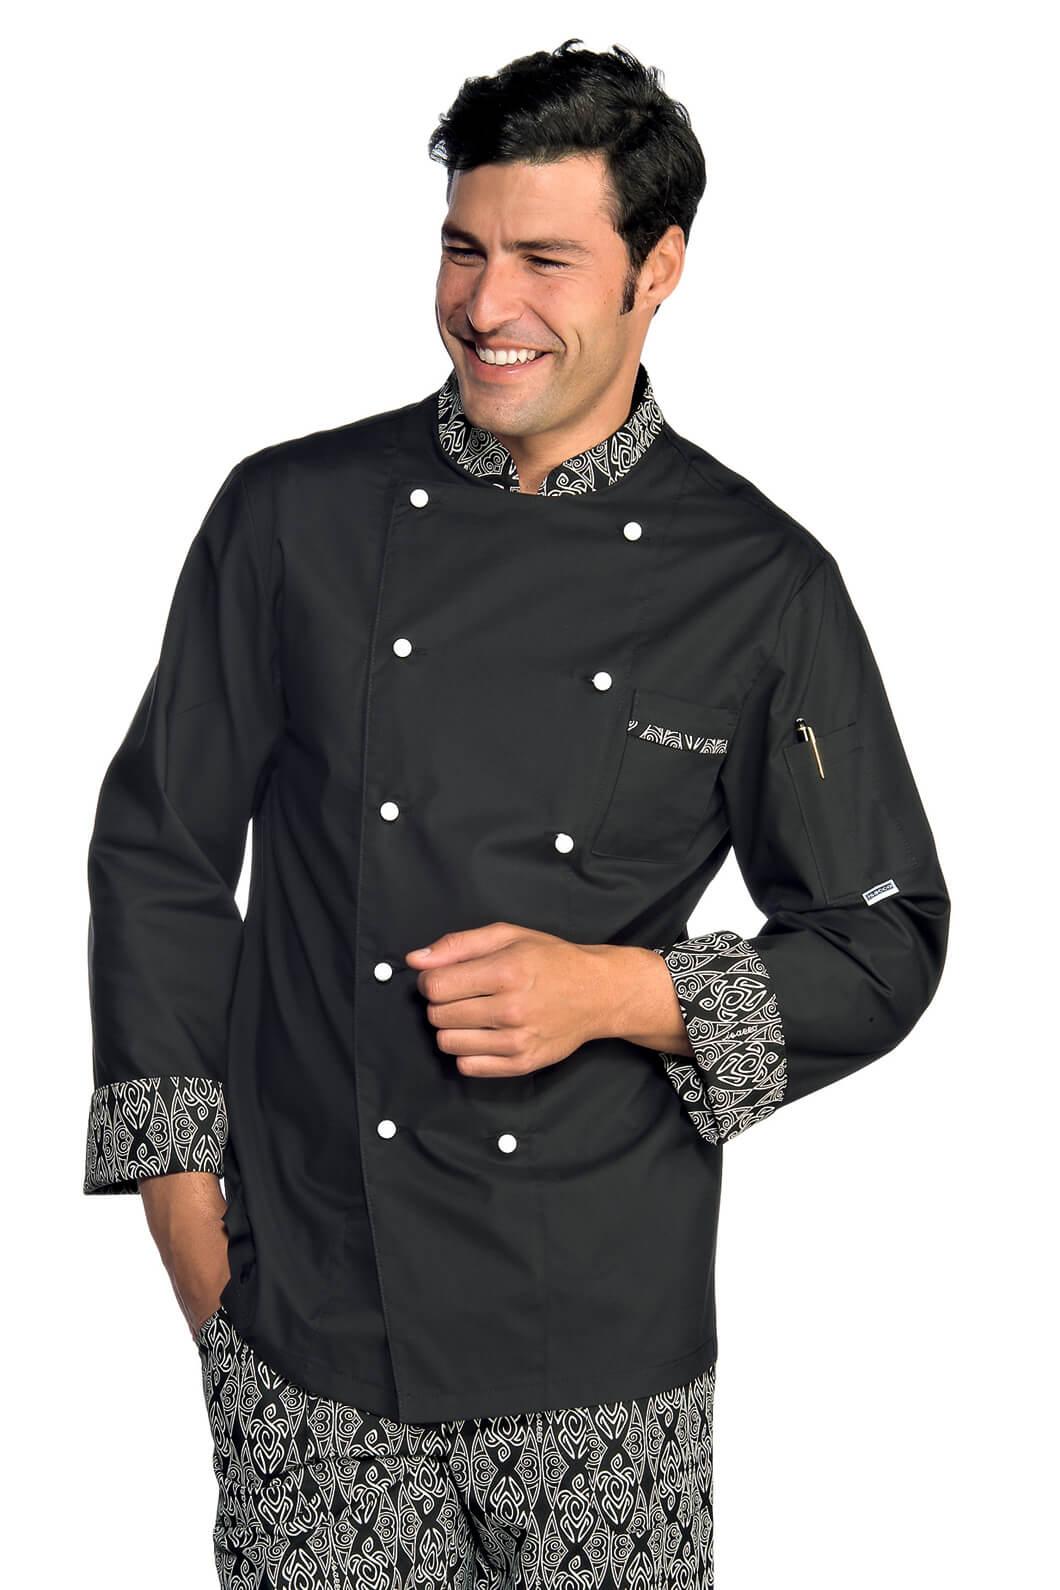 Veste chef cuisinier extralight noir blanc vestes de for Cuisinier extra